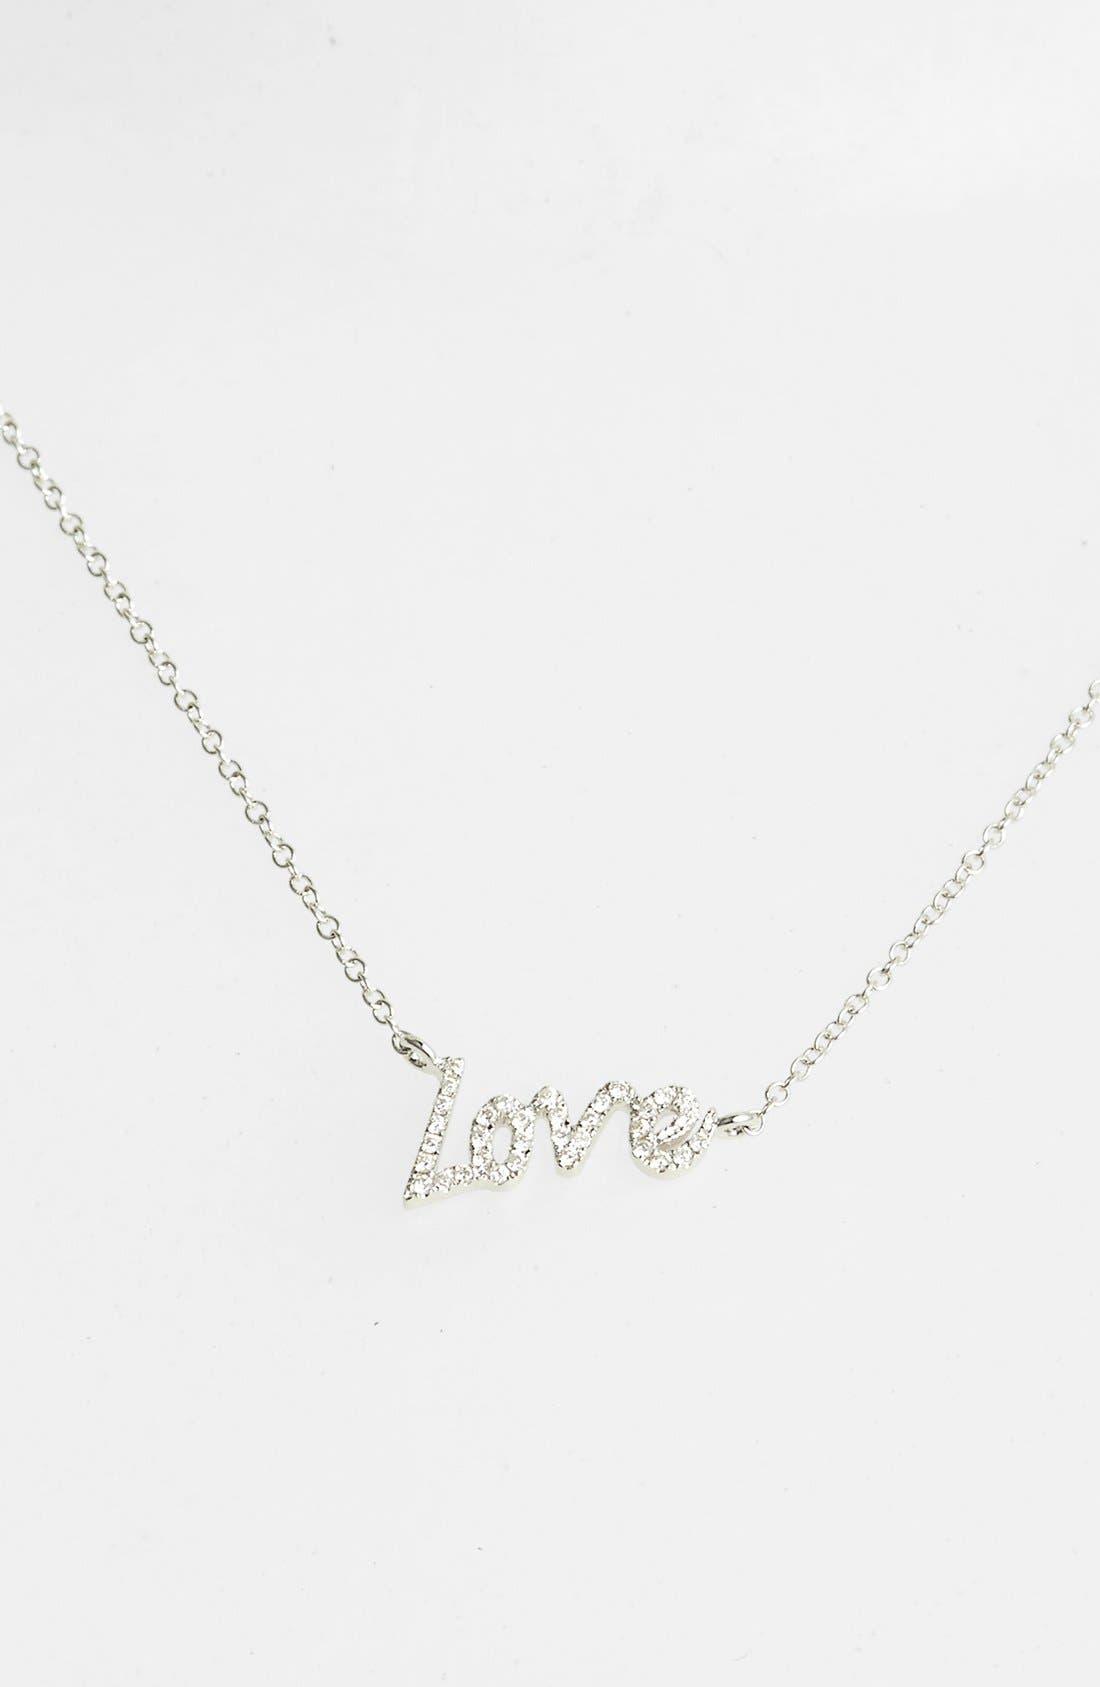 MeiraT Dazzling Diamond Love Pendant Necklace,                         Main,                         color, White Gold